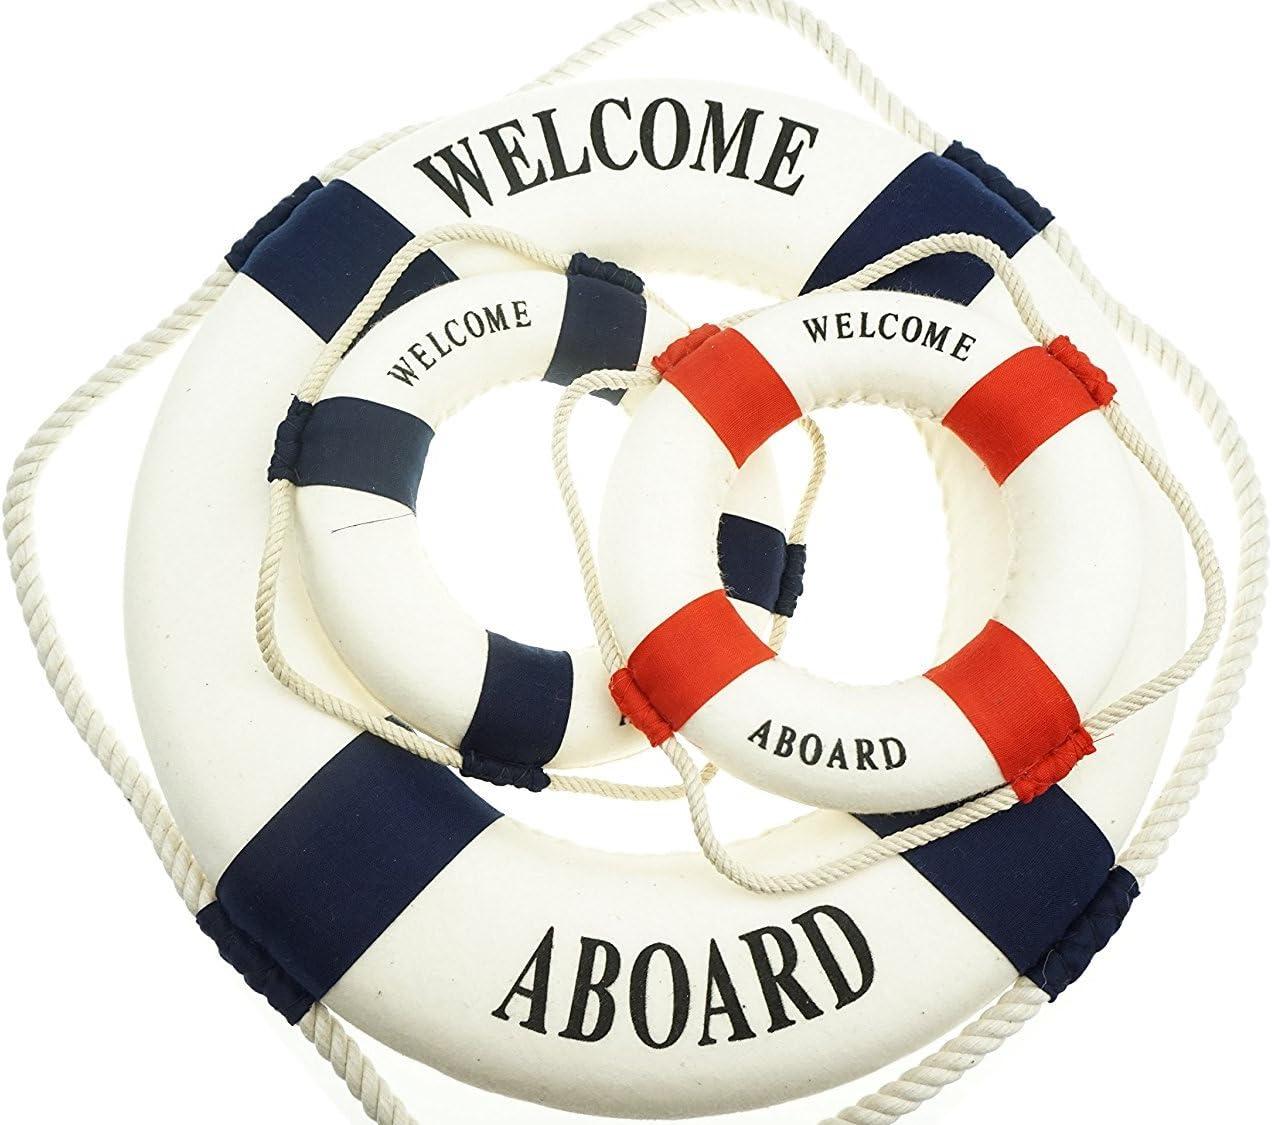 Bilipala 3Pcs Cloth Life Ring Buoy, Home Wall Nautical Decor, 12.5 & 5.5 Inches